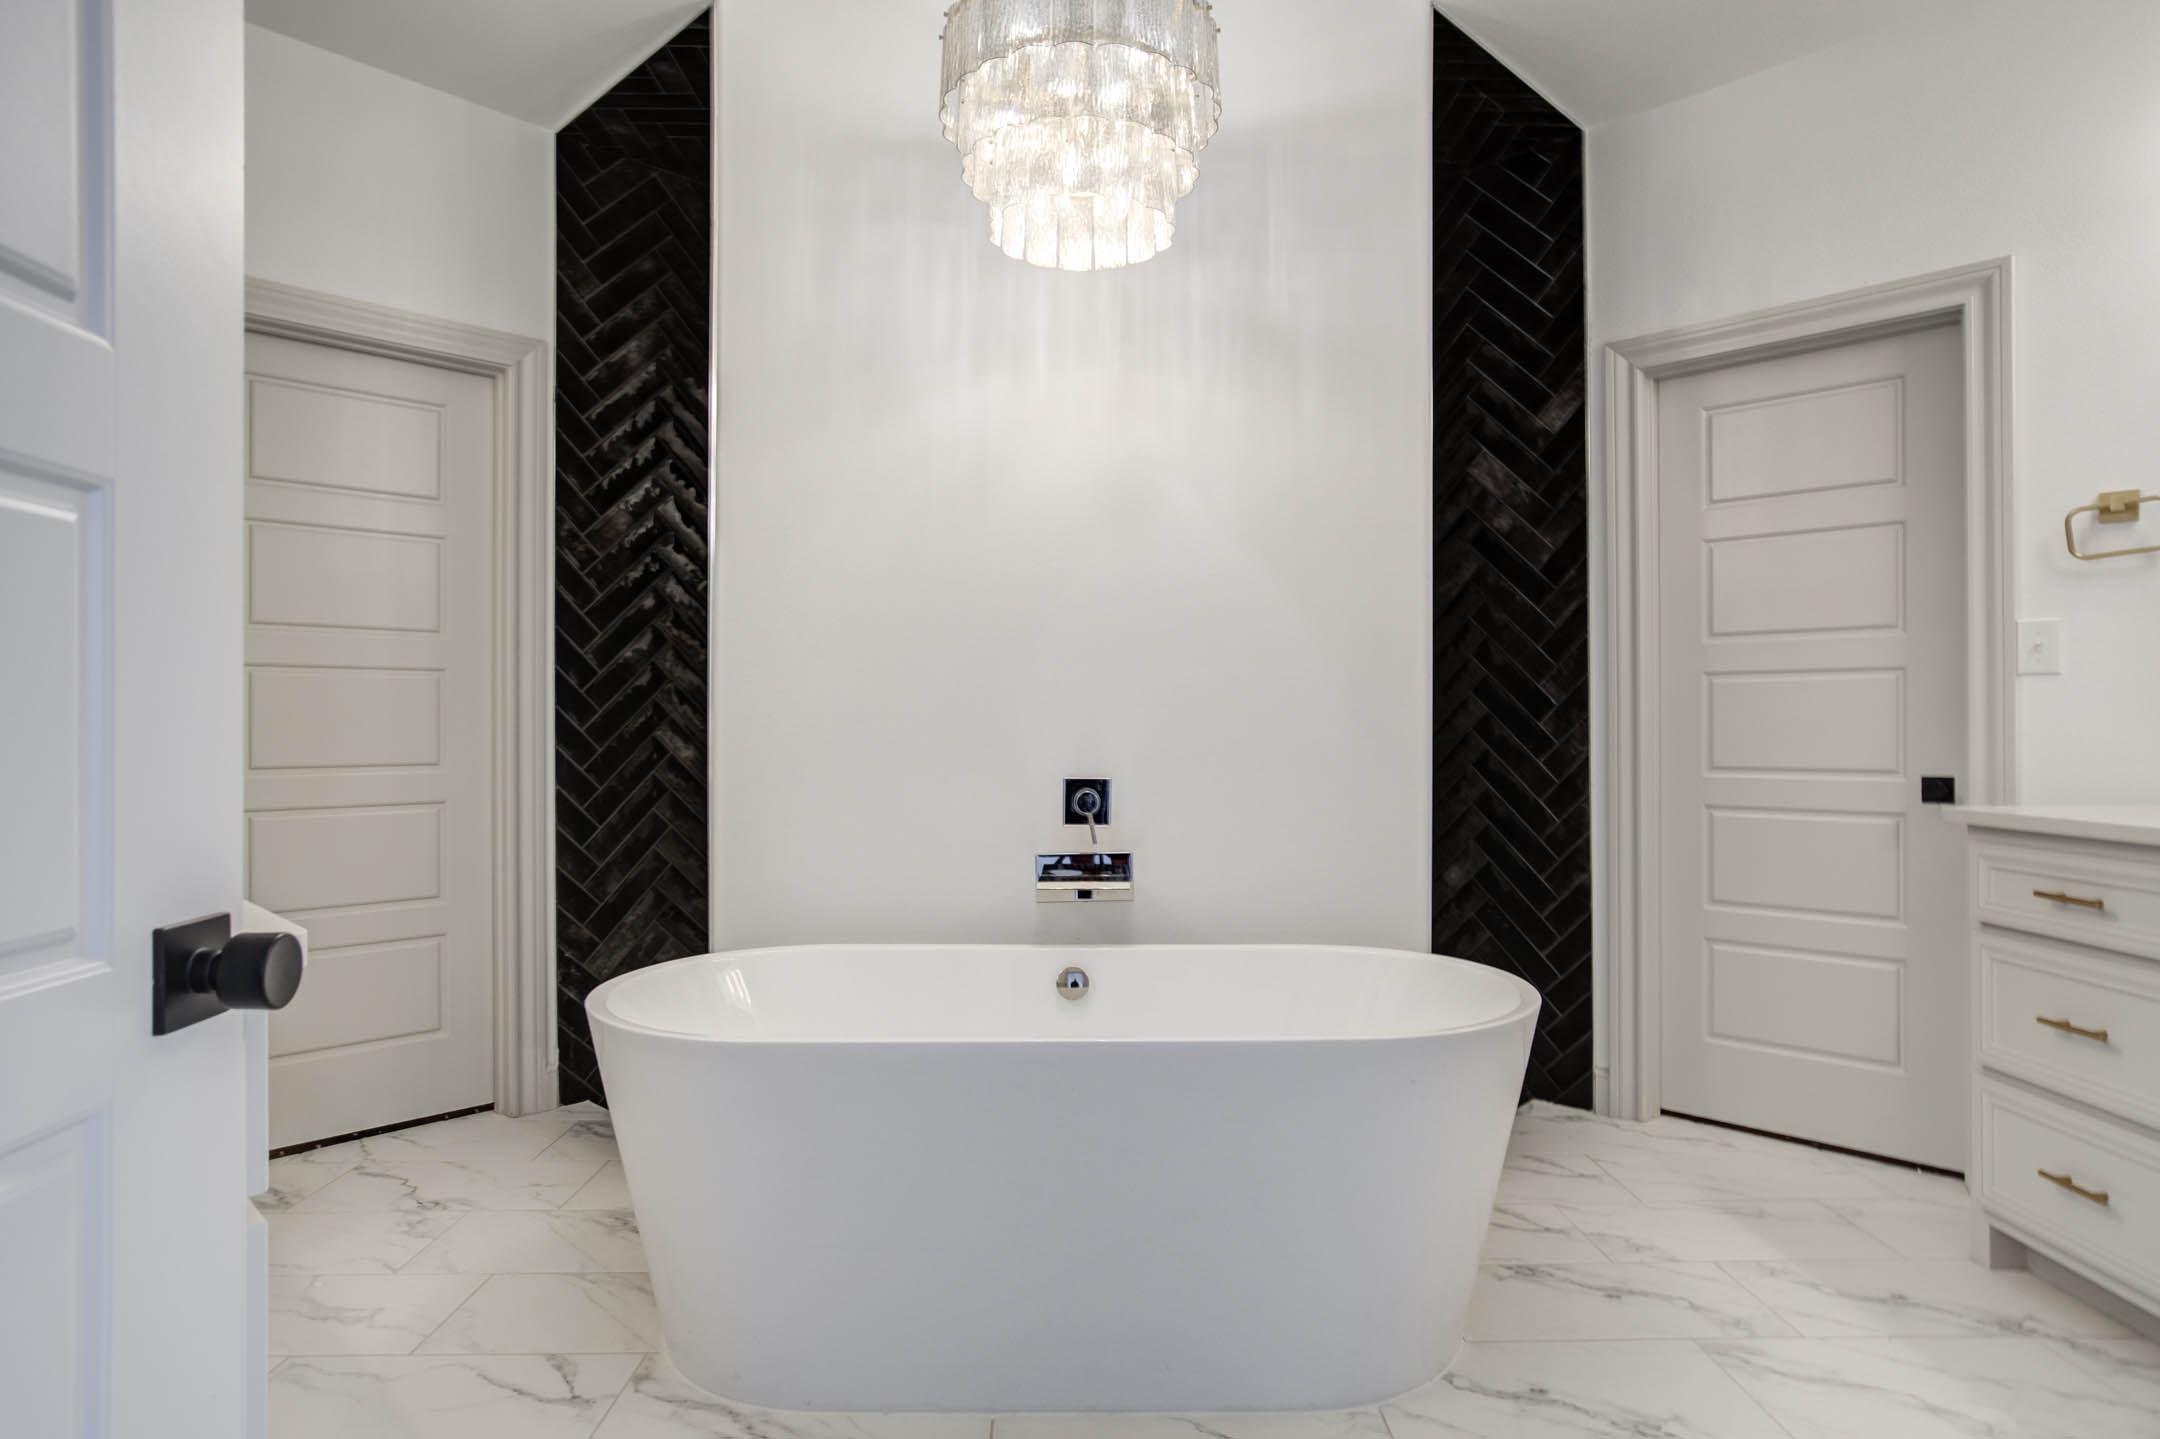 View of bathtub of master bath in beautiful home near Lubbock, Texas.